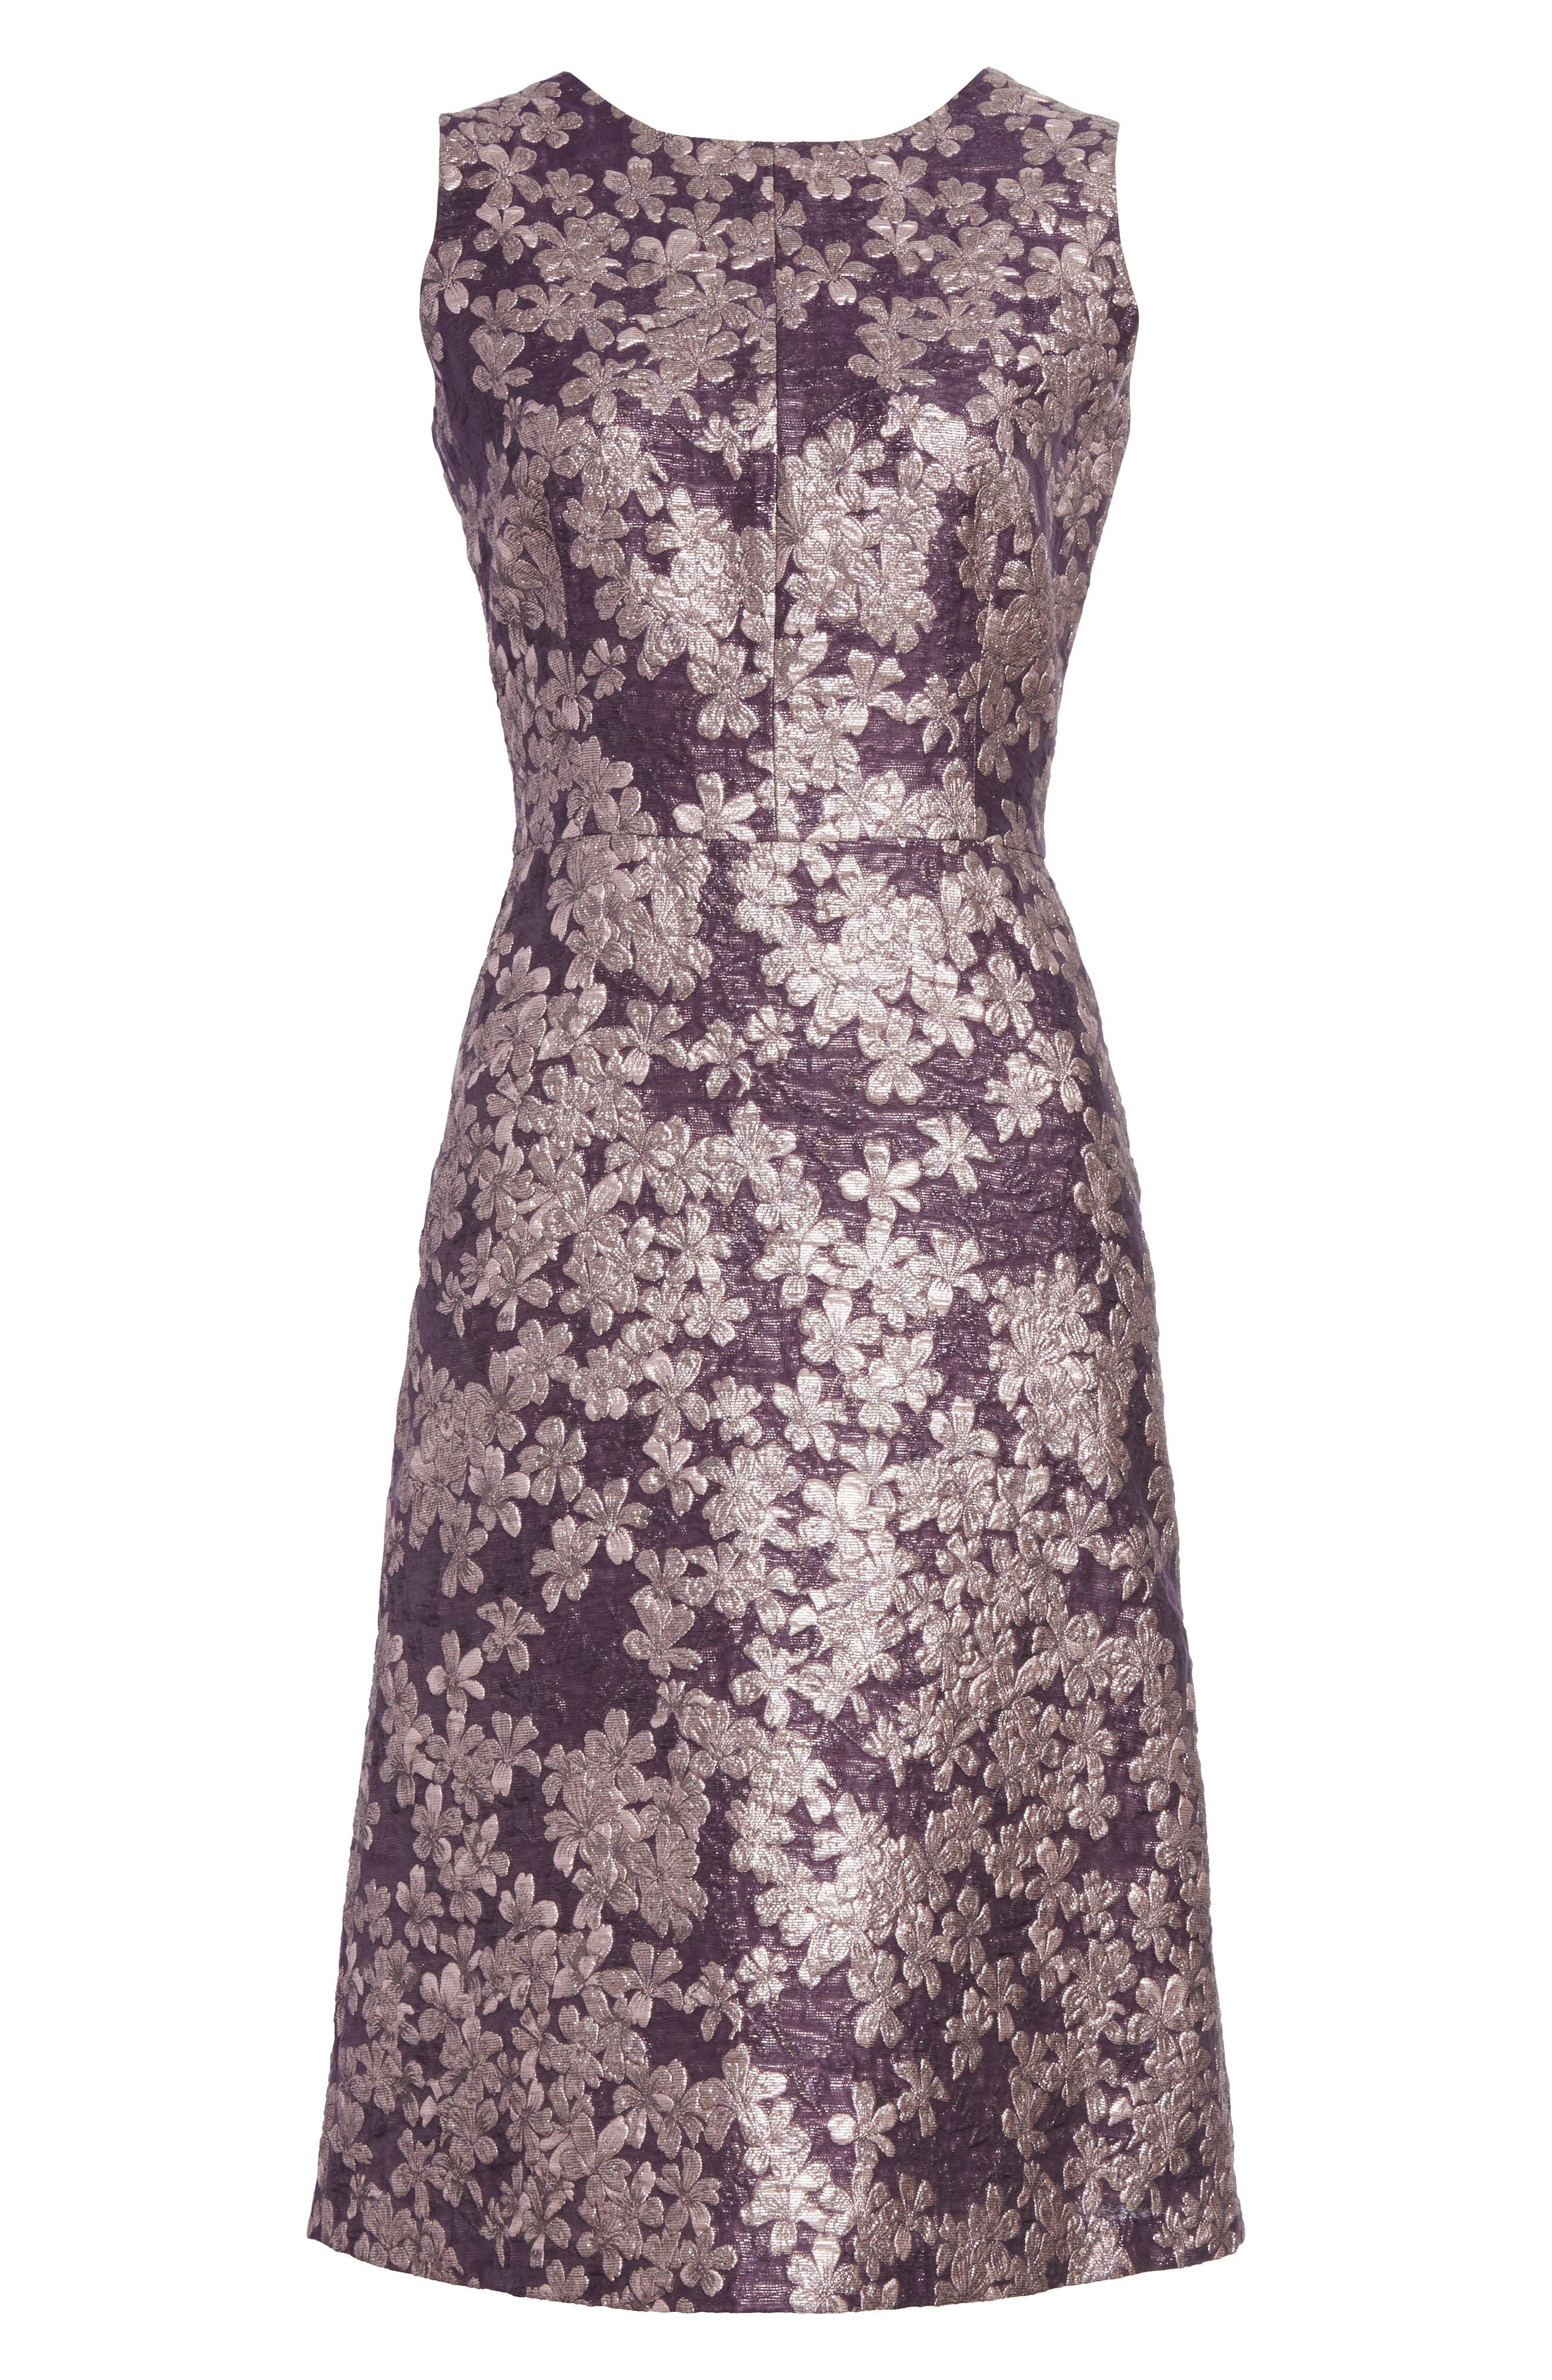 Metallic Floral Jacquard Dress,                             Alternate thumbnail 7, color,                             Orchid Multi